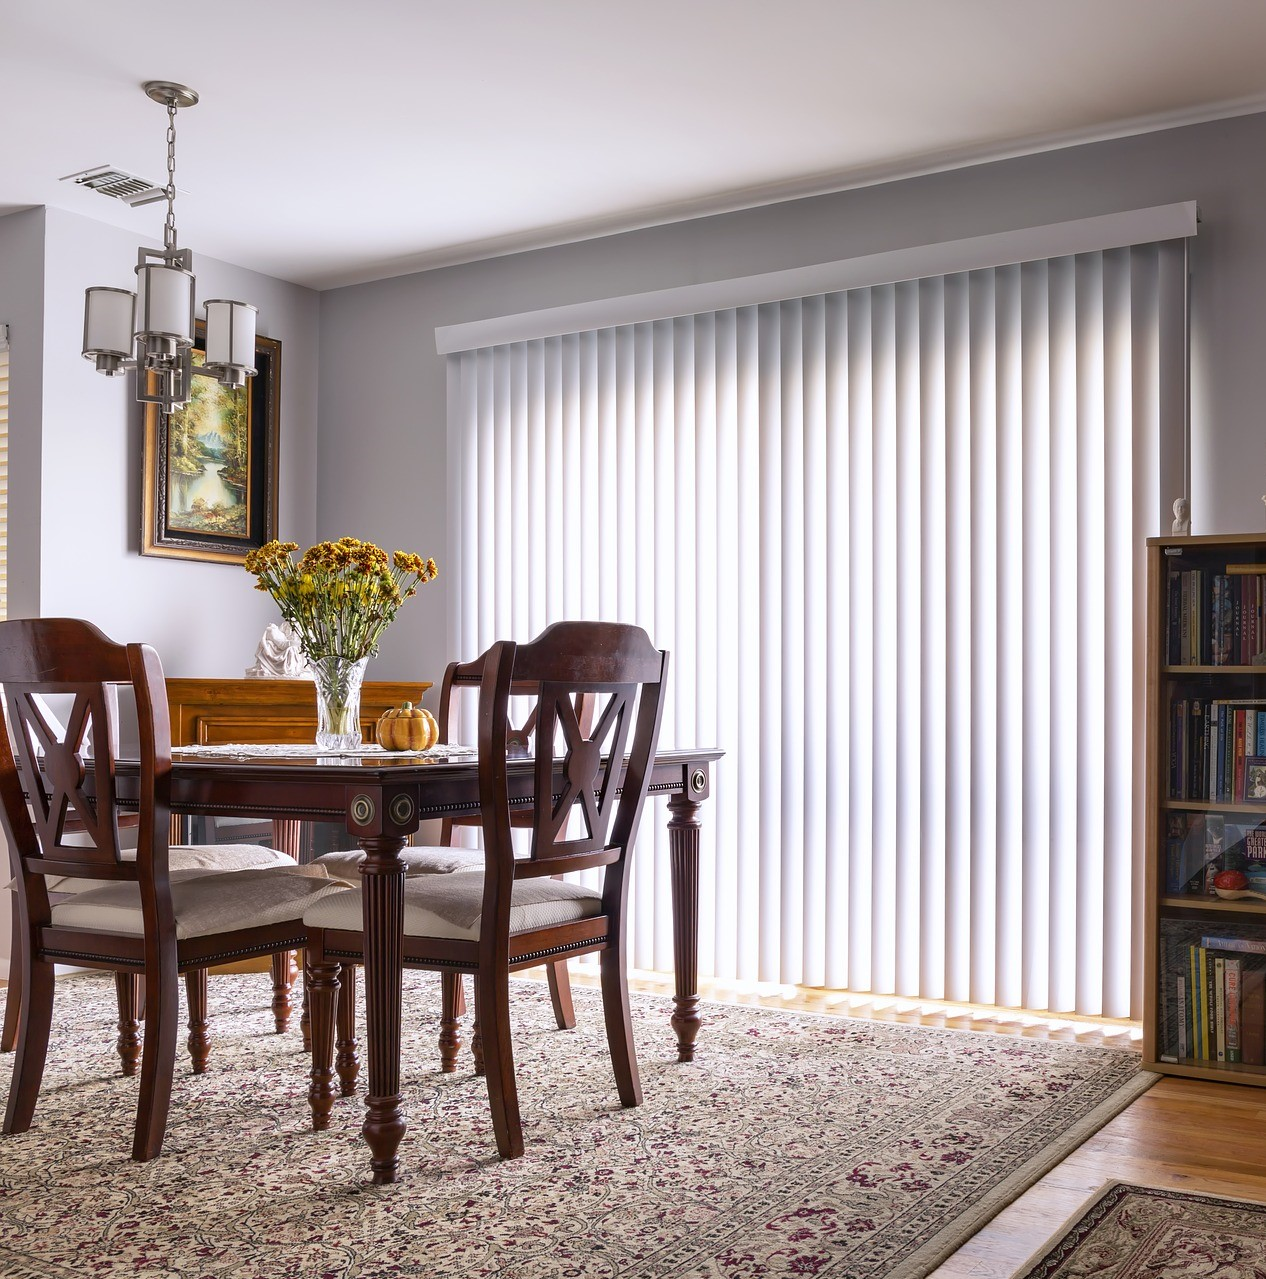 home-interior-1748936_1920 (2).jpg